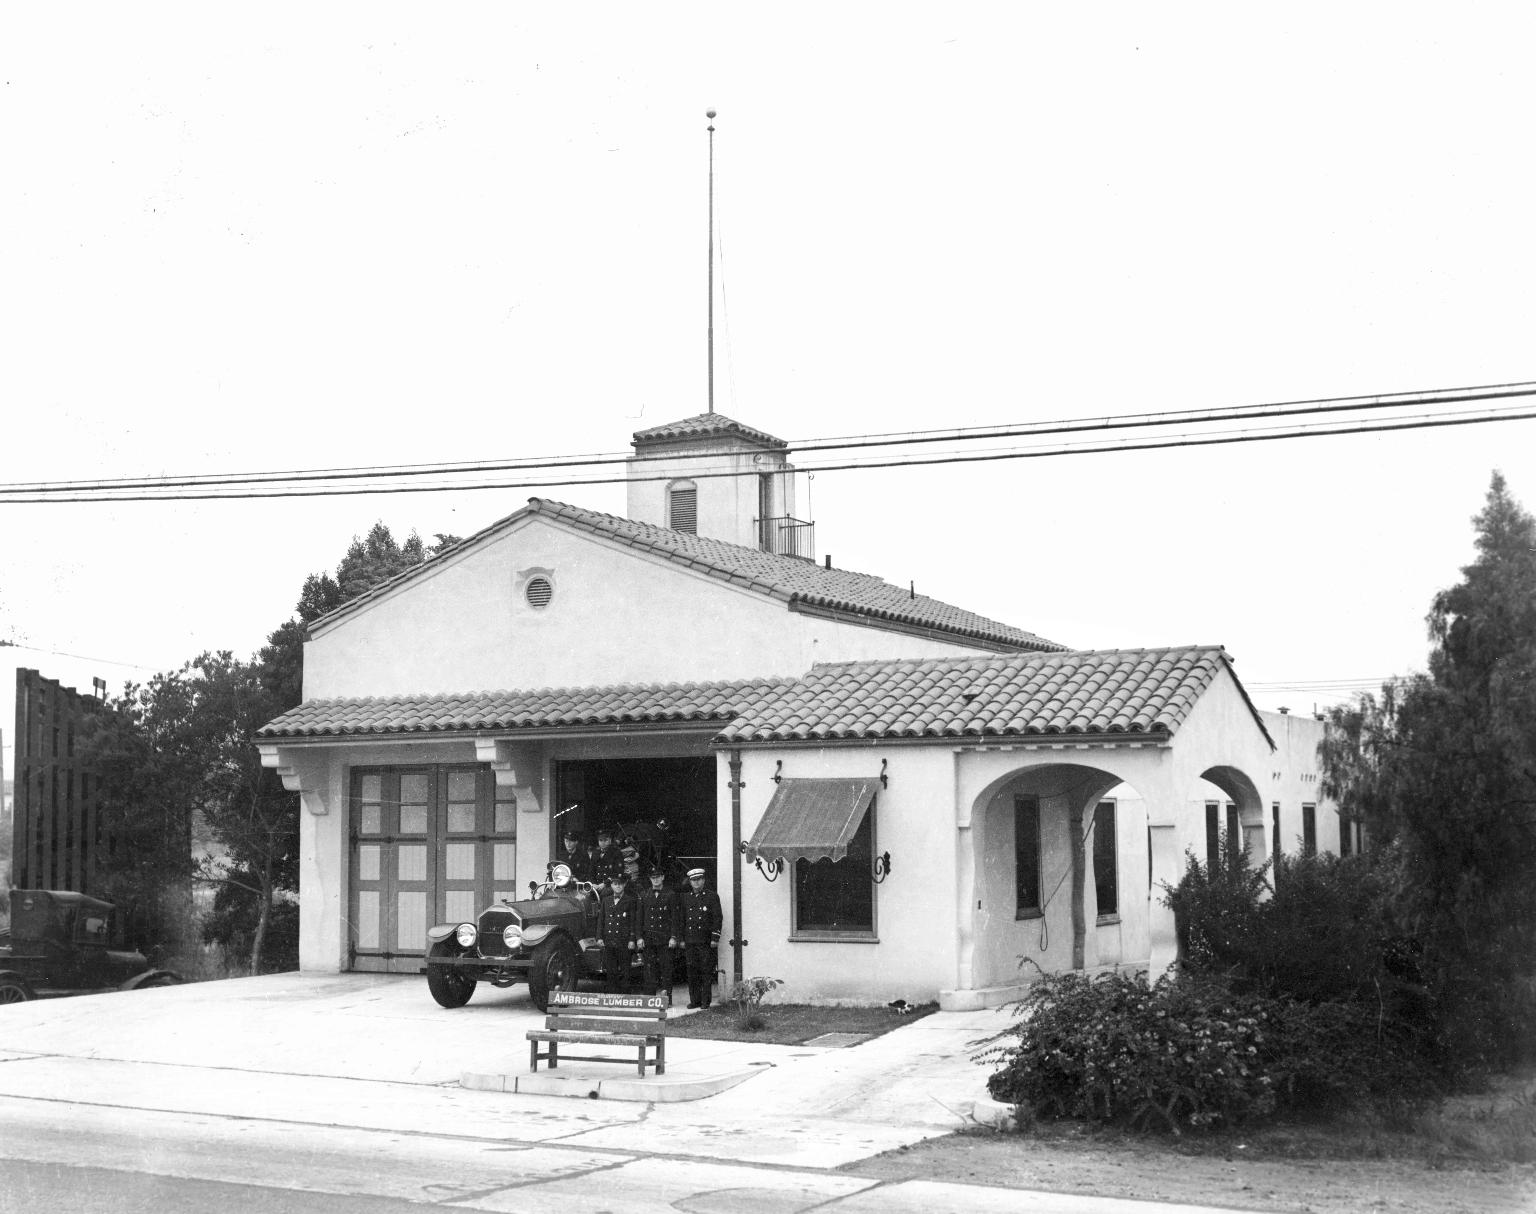 Santa Barbara Fire Station